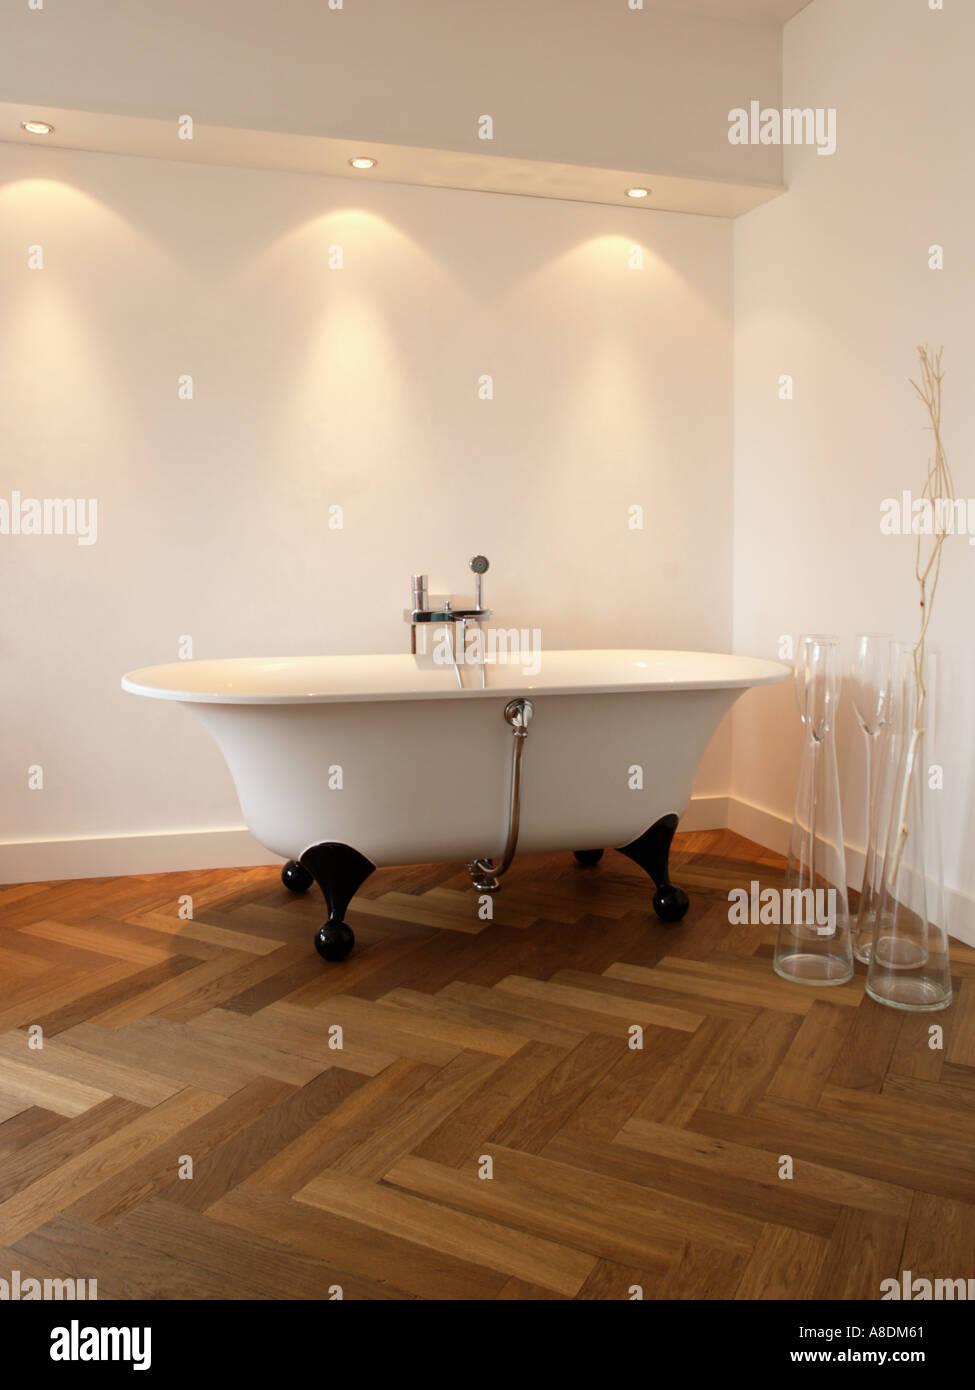 Designer Bathroom With Herringbone Parquet Halogen Lighting And Free  Standing Bath